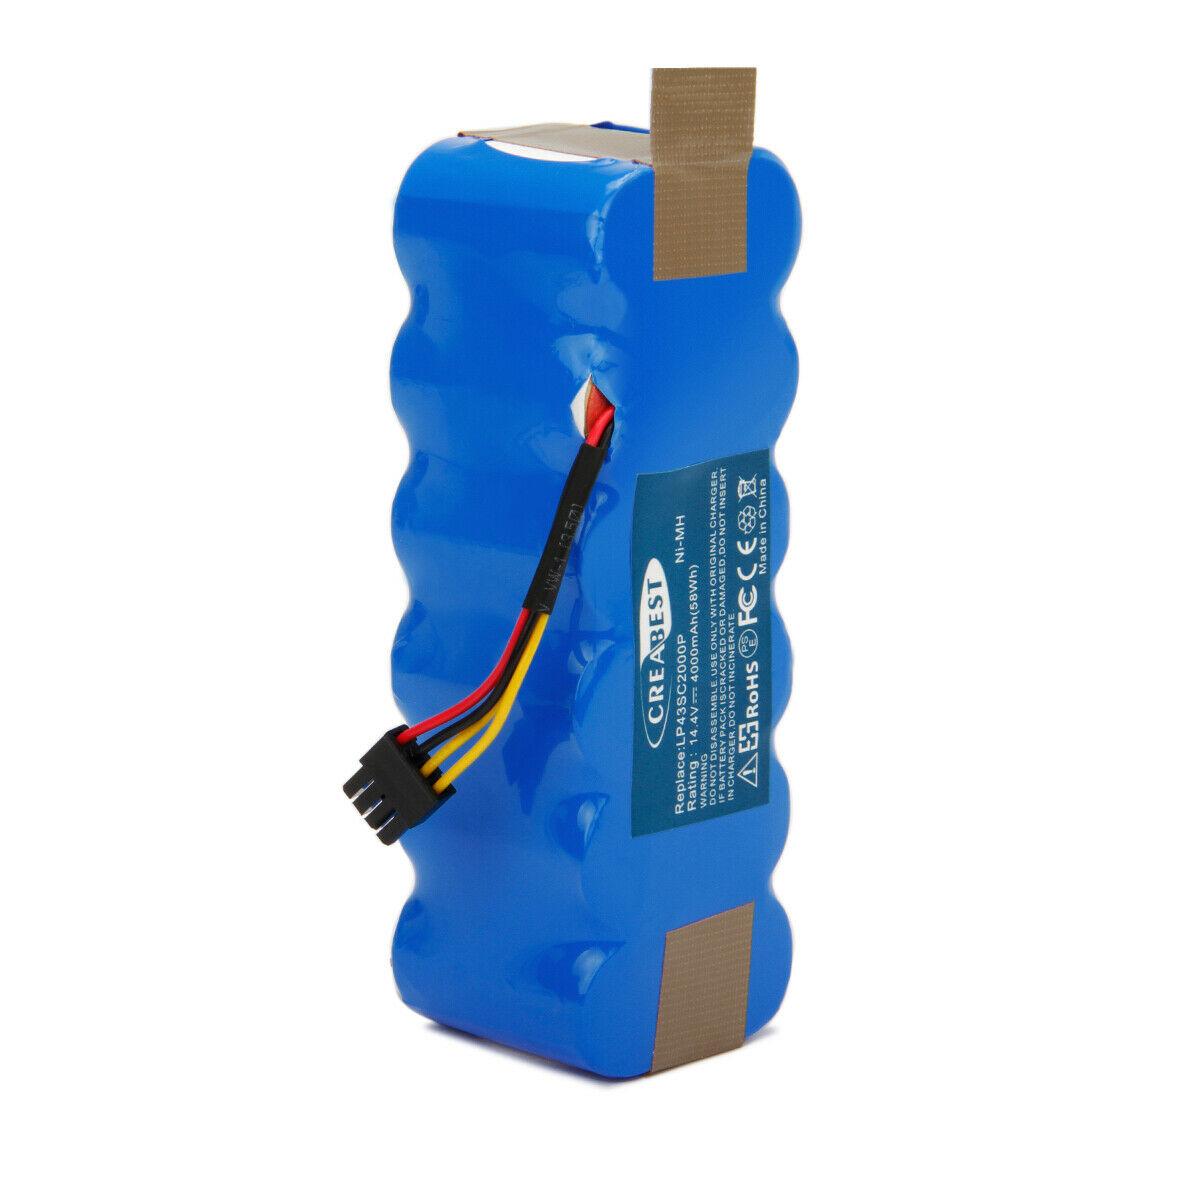 4.0AH 14.4V Ni-MH Ariete Briciola 2711 2712 2713 2717 CR120 X500 KK-8 compatible Battery